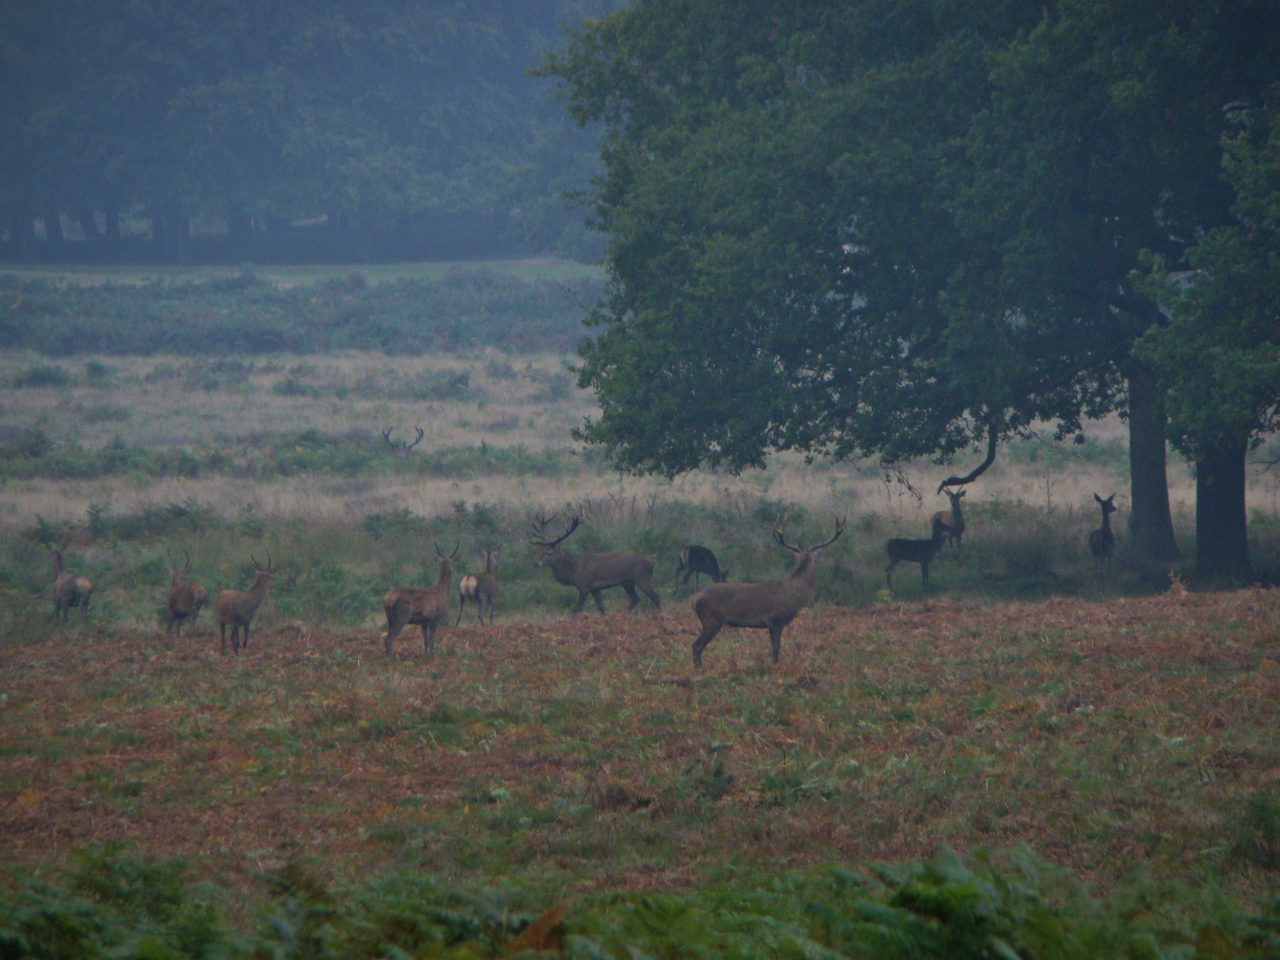 Red deer in Richmond Park, London, 3 October 2015